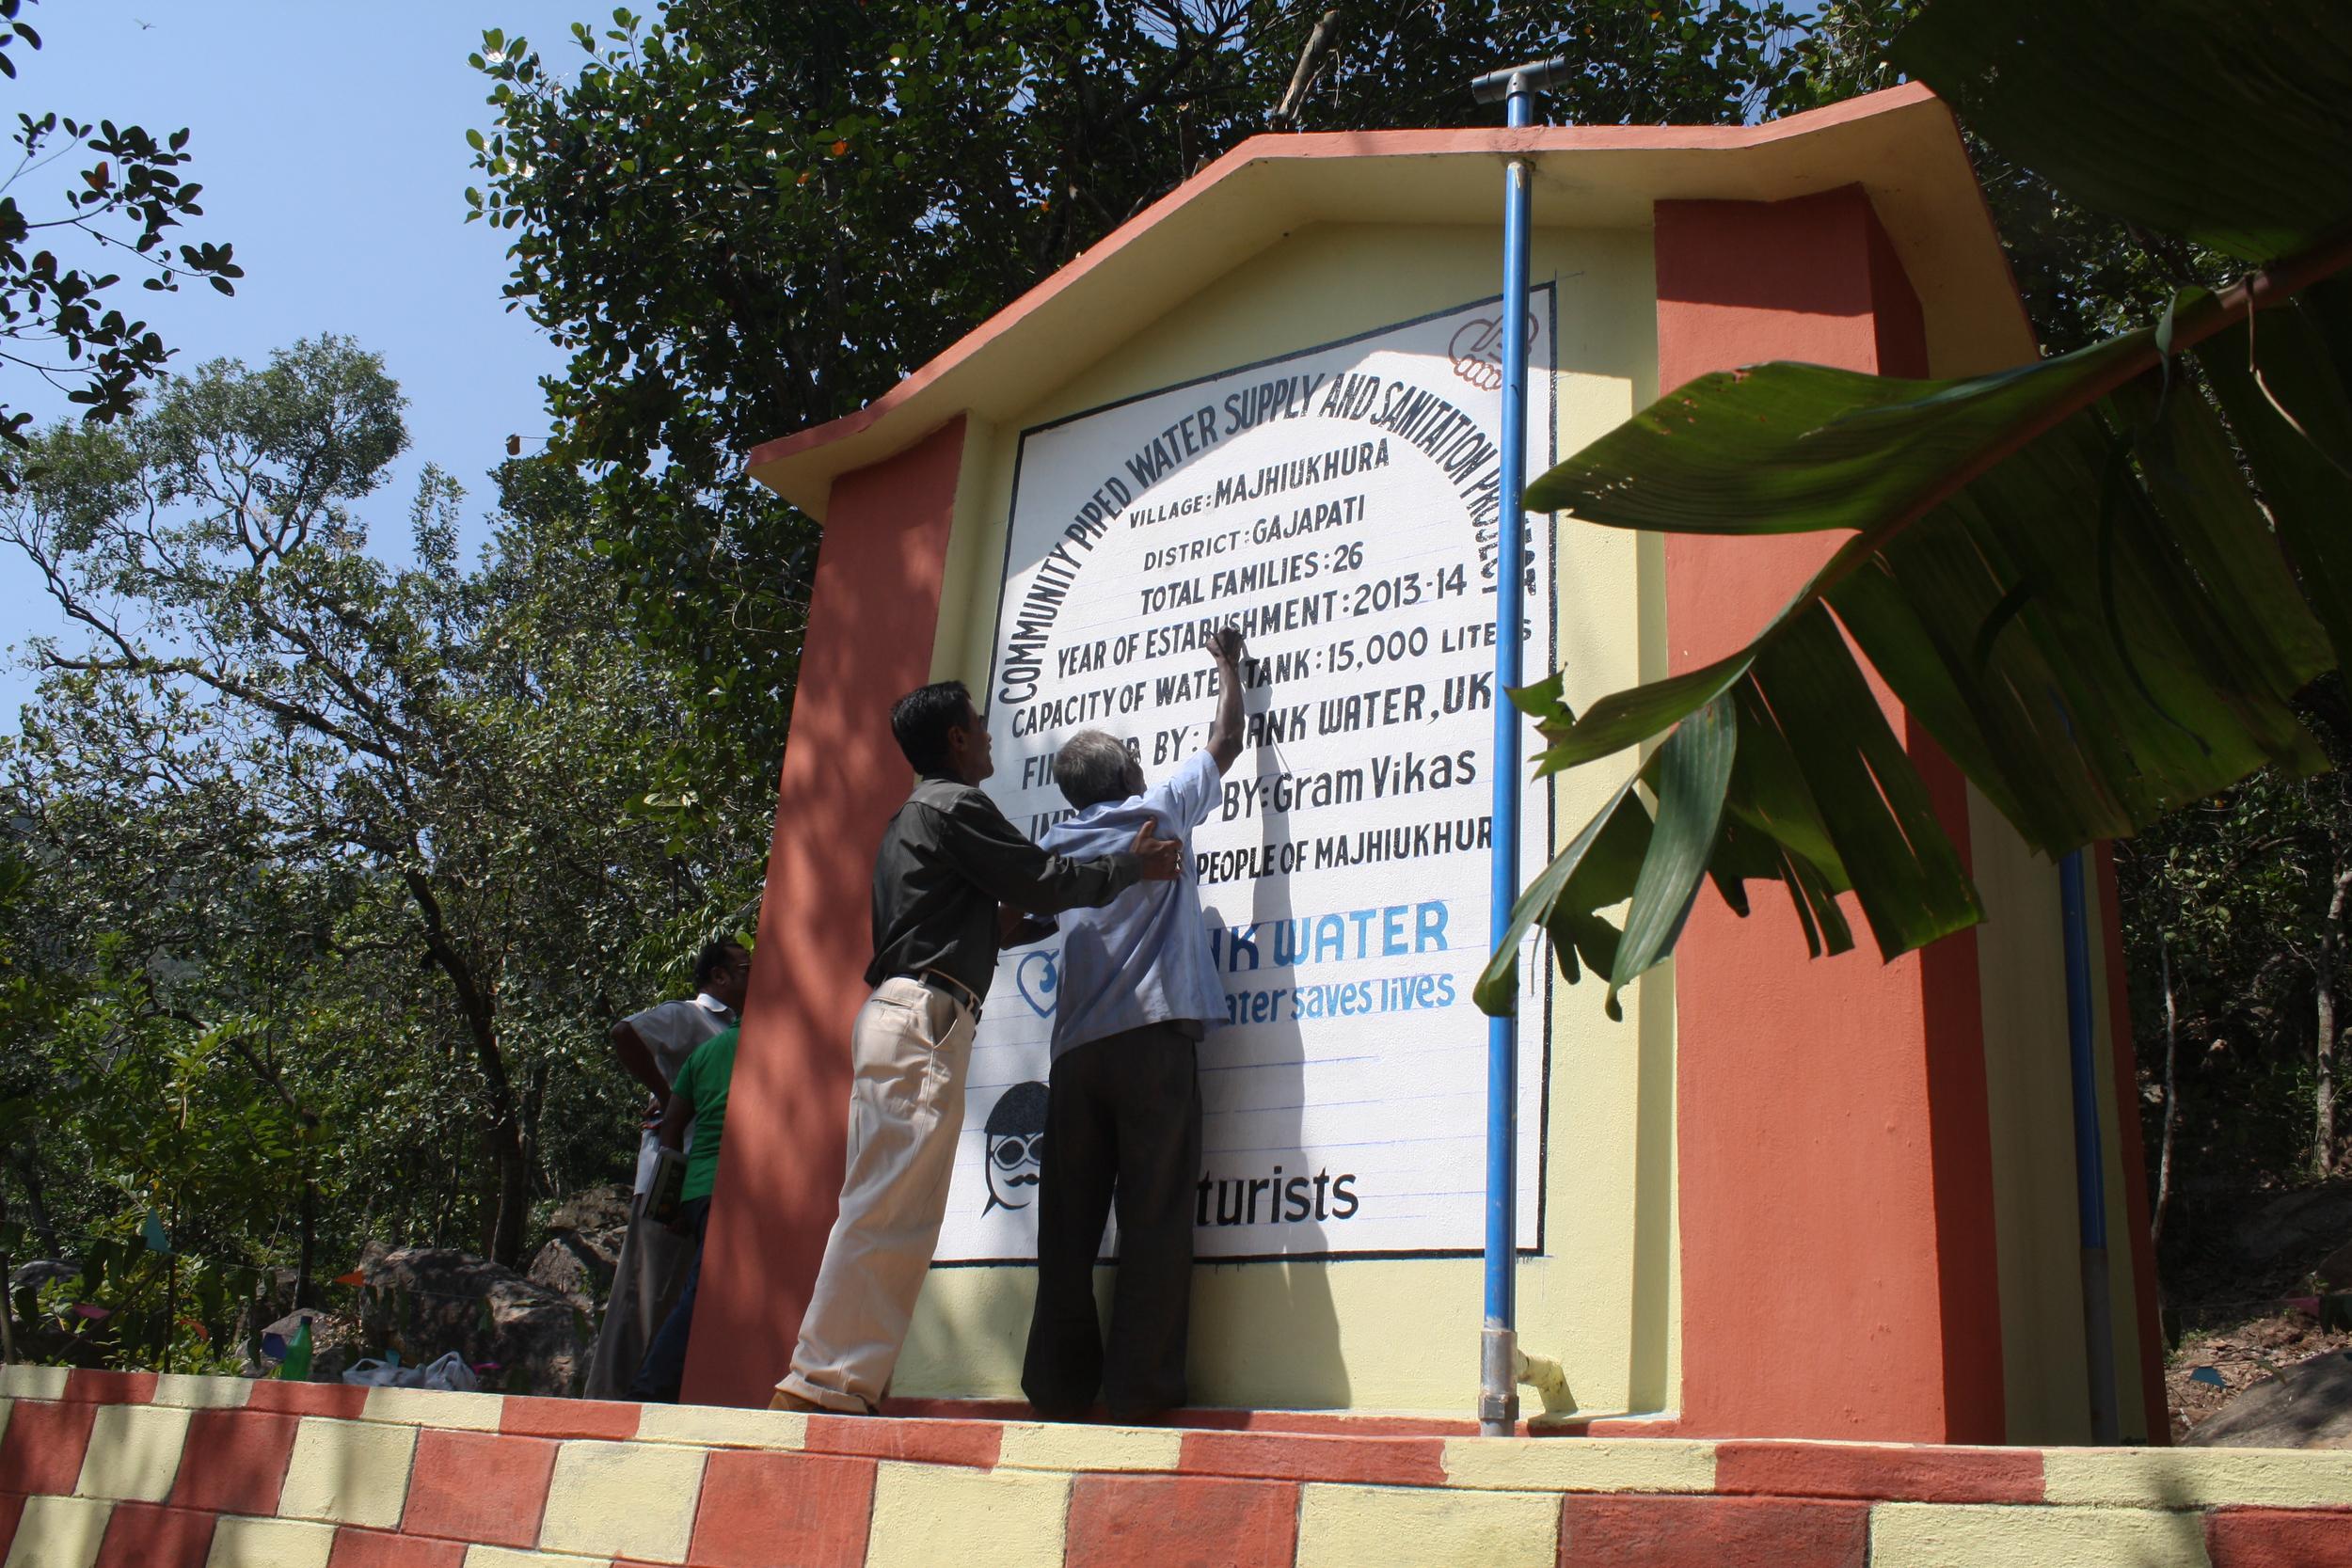 Kailash Sahu, field coordinator with Gram Vikas helping the old painter finish the last bit of work on the water tank. Photography: Praveena Sridhar, FRANK Water India Coordinator